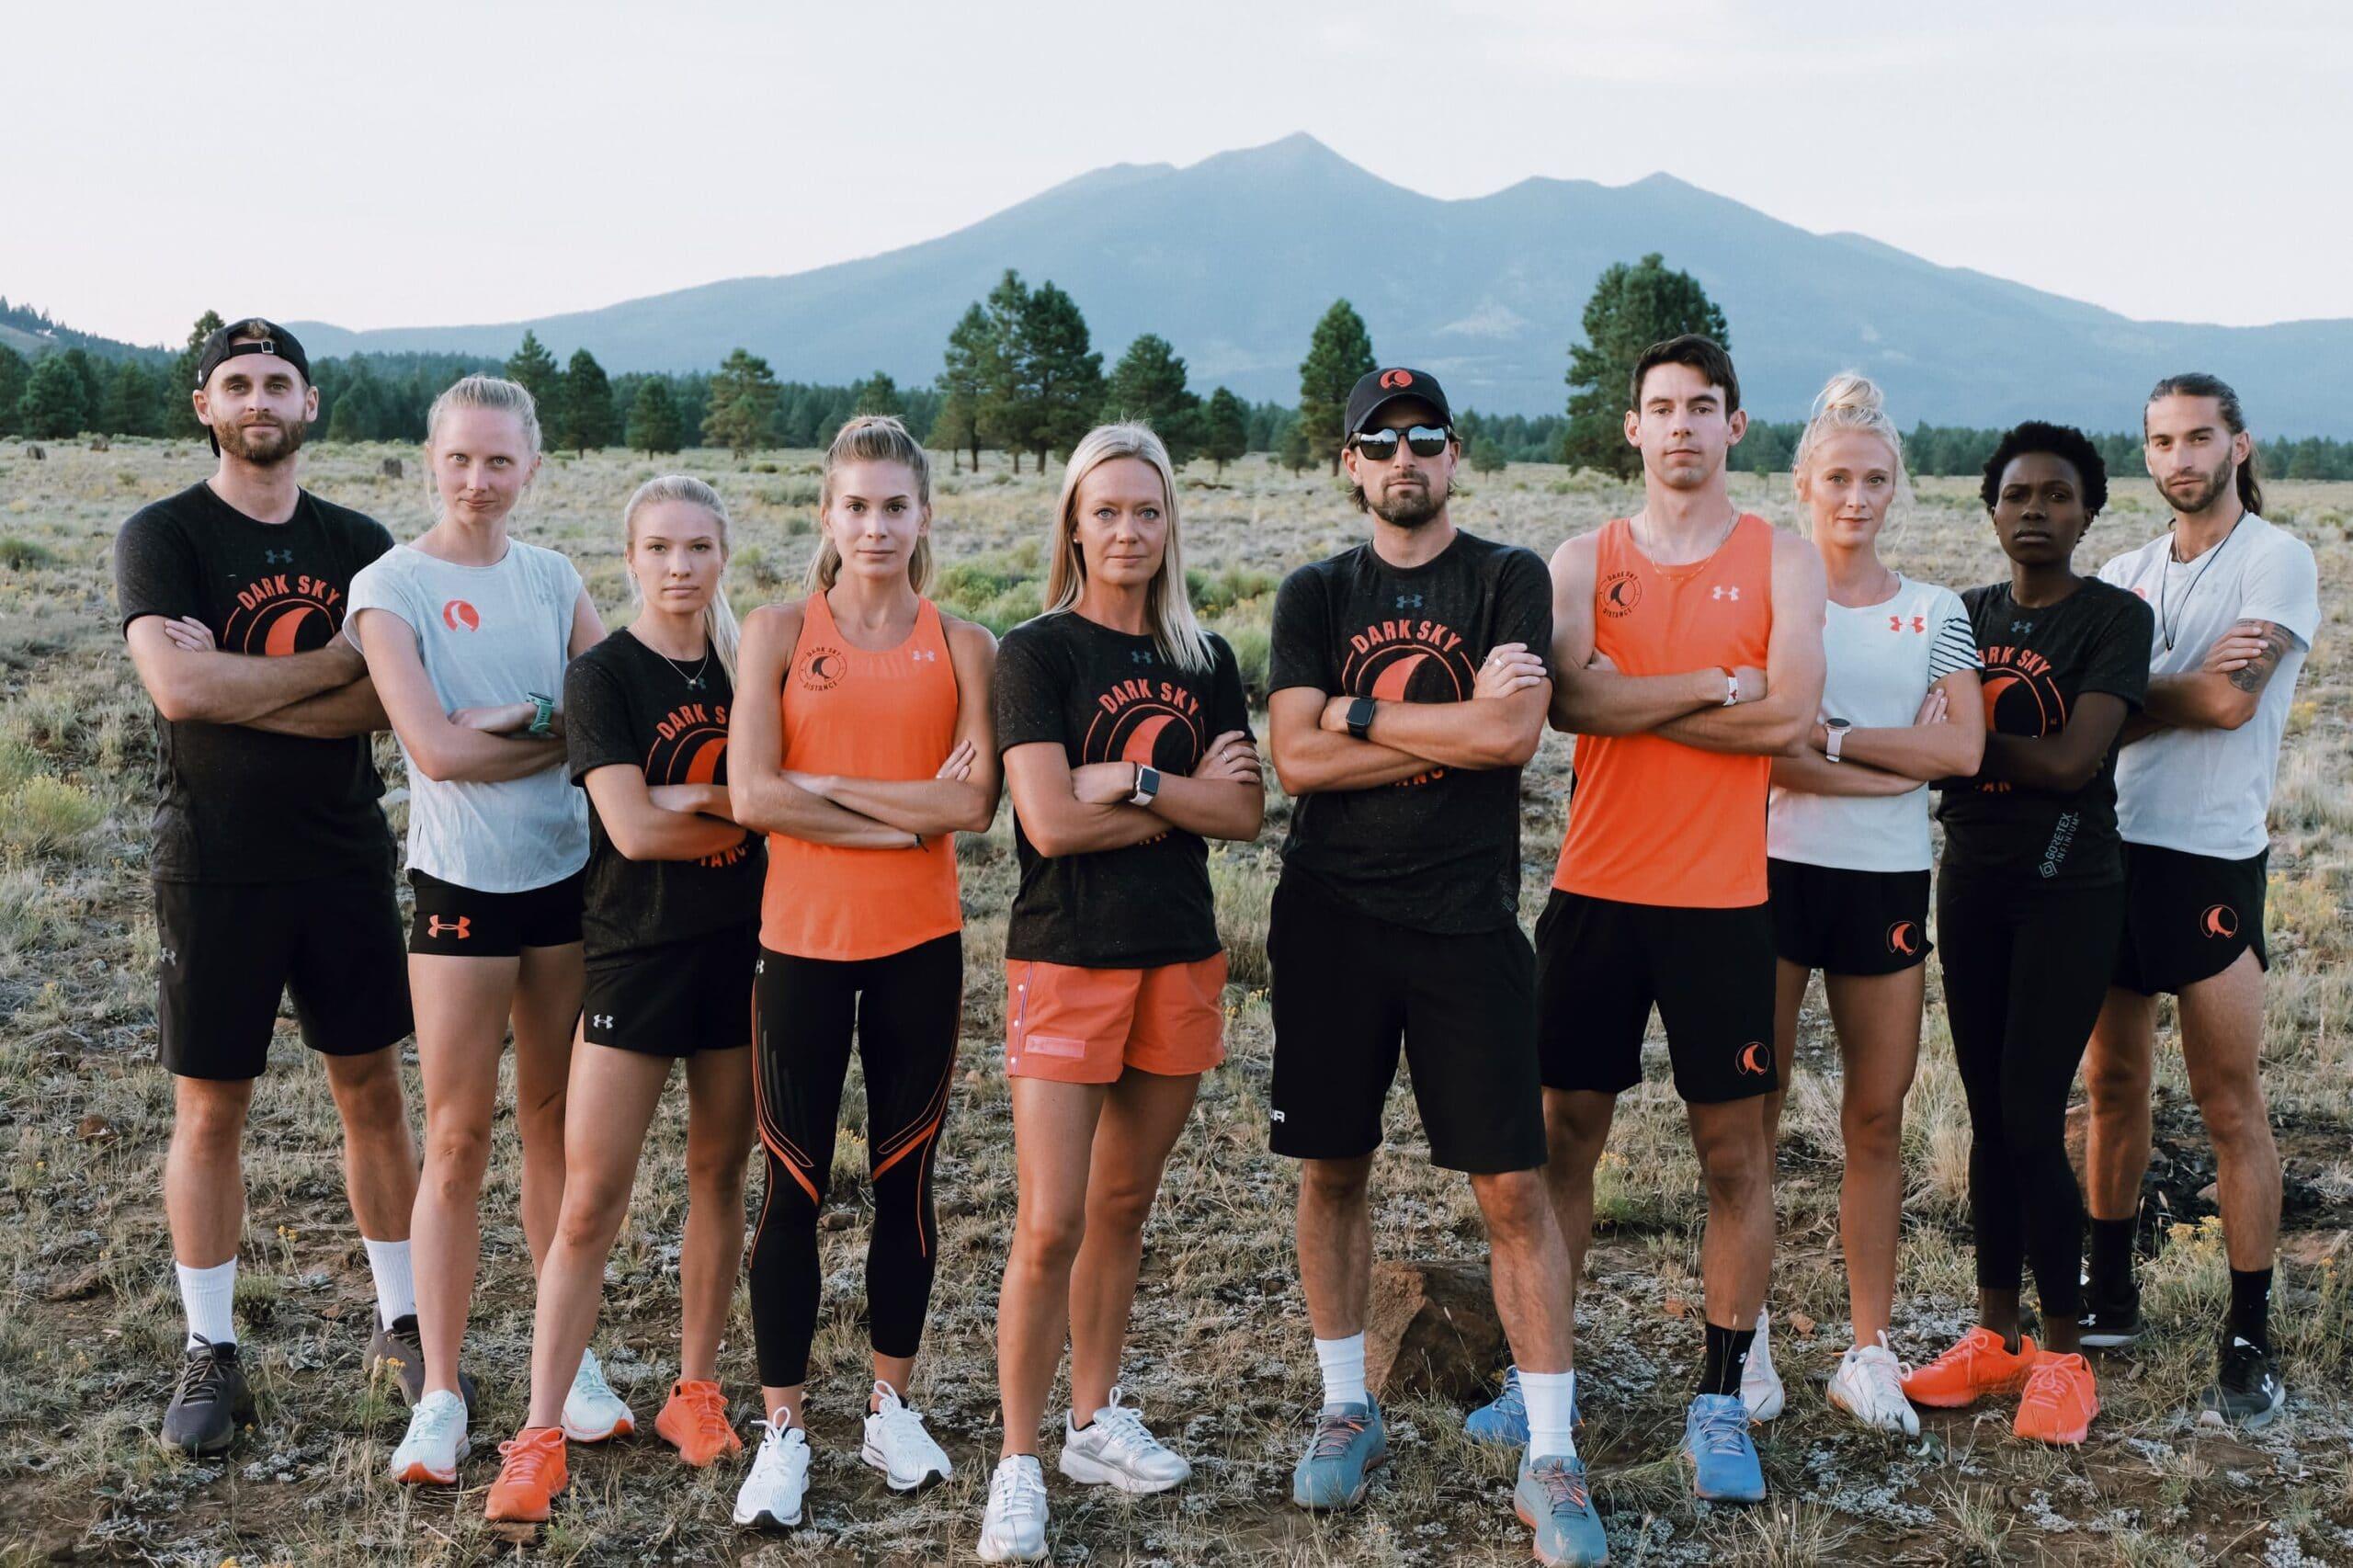 Under Armours Pro Run Team